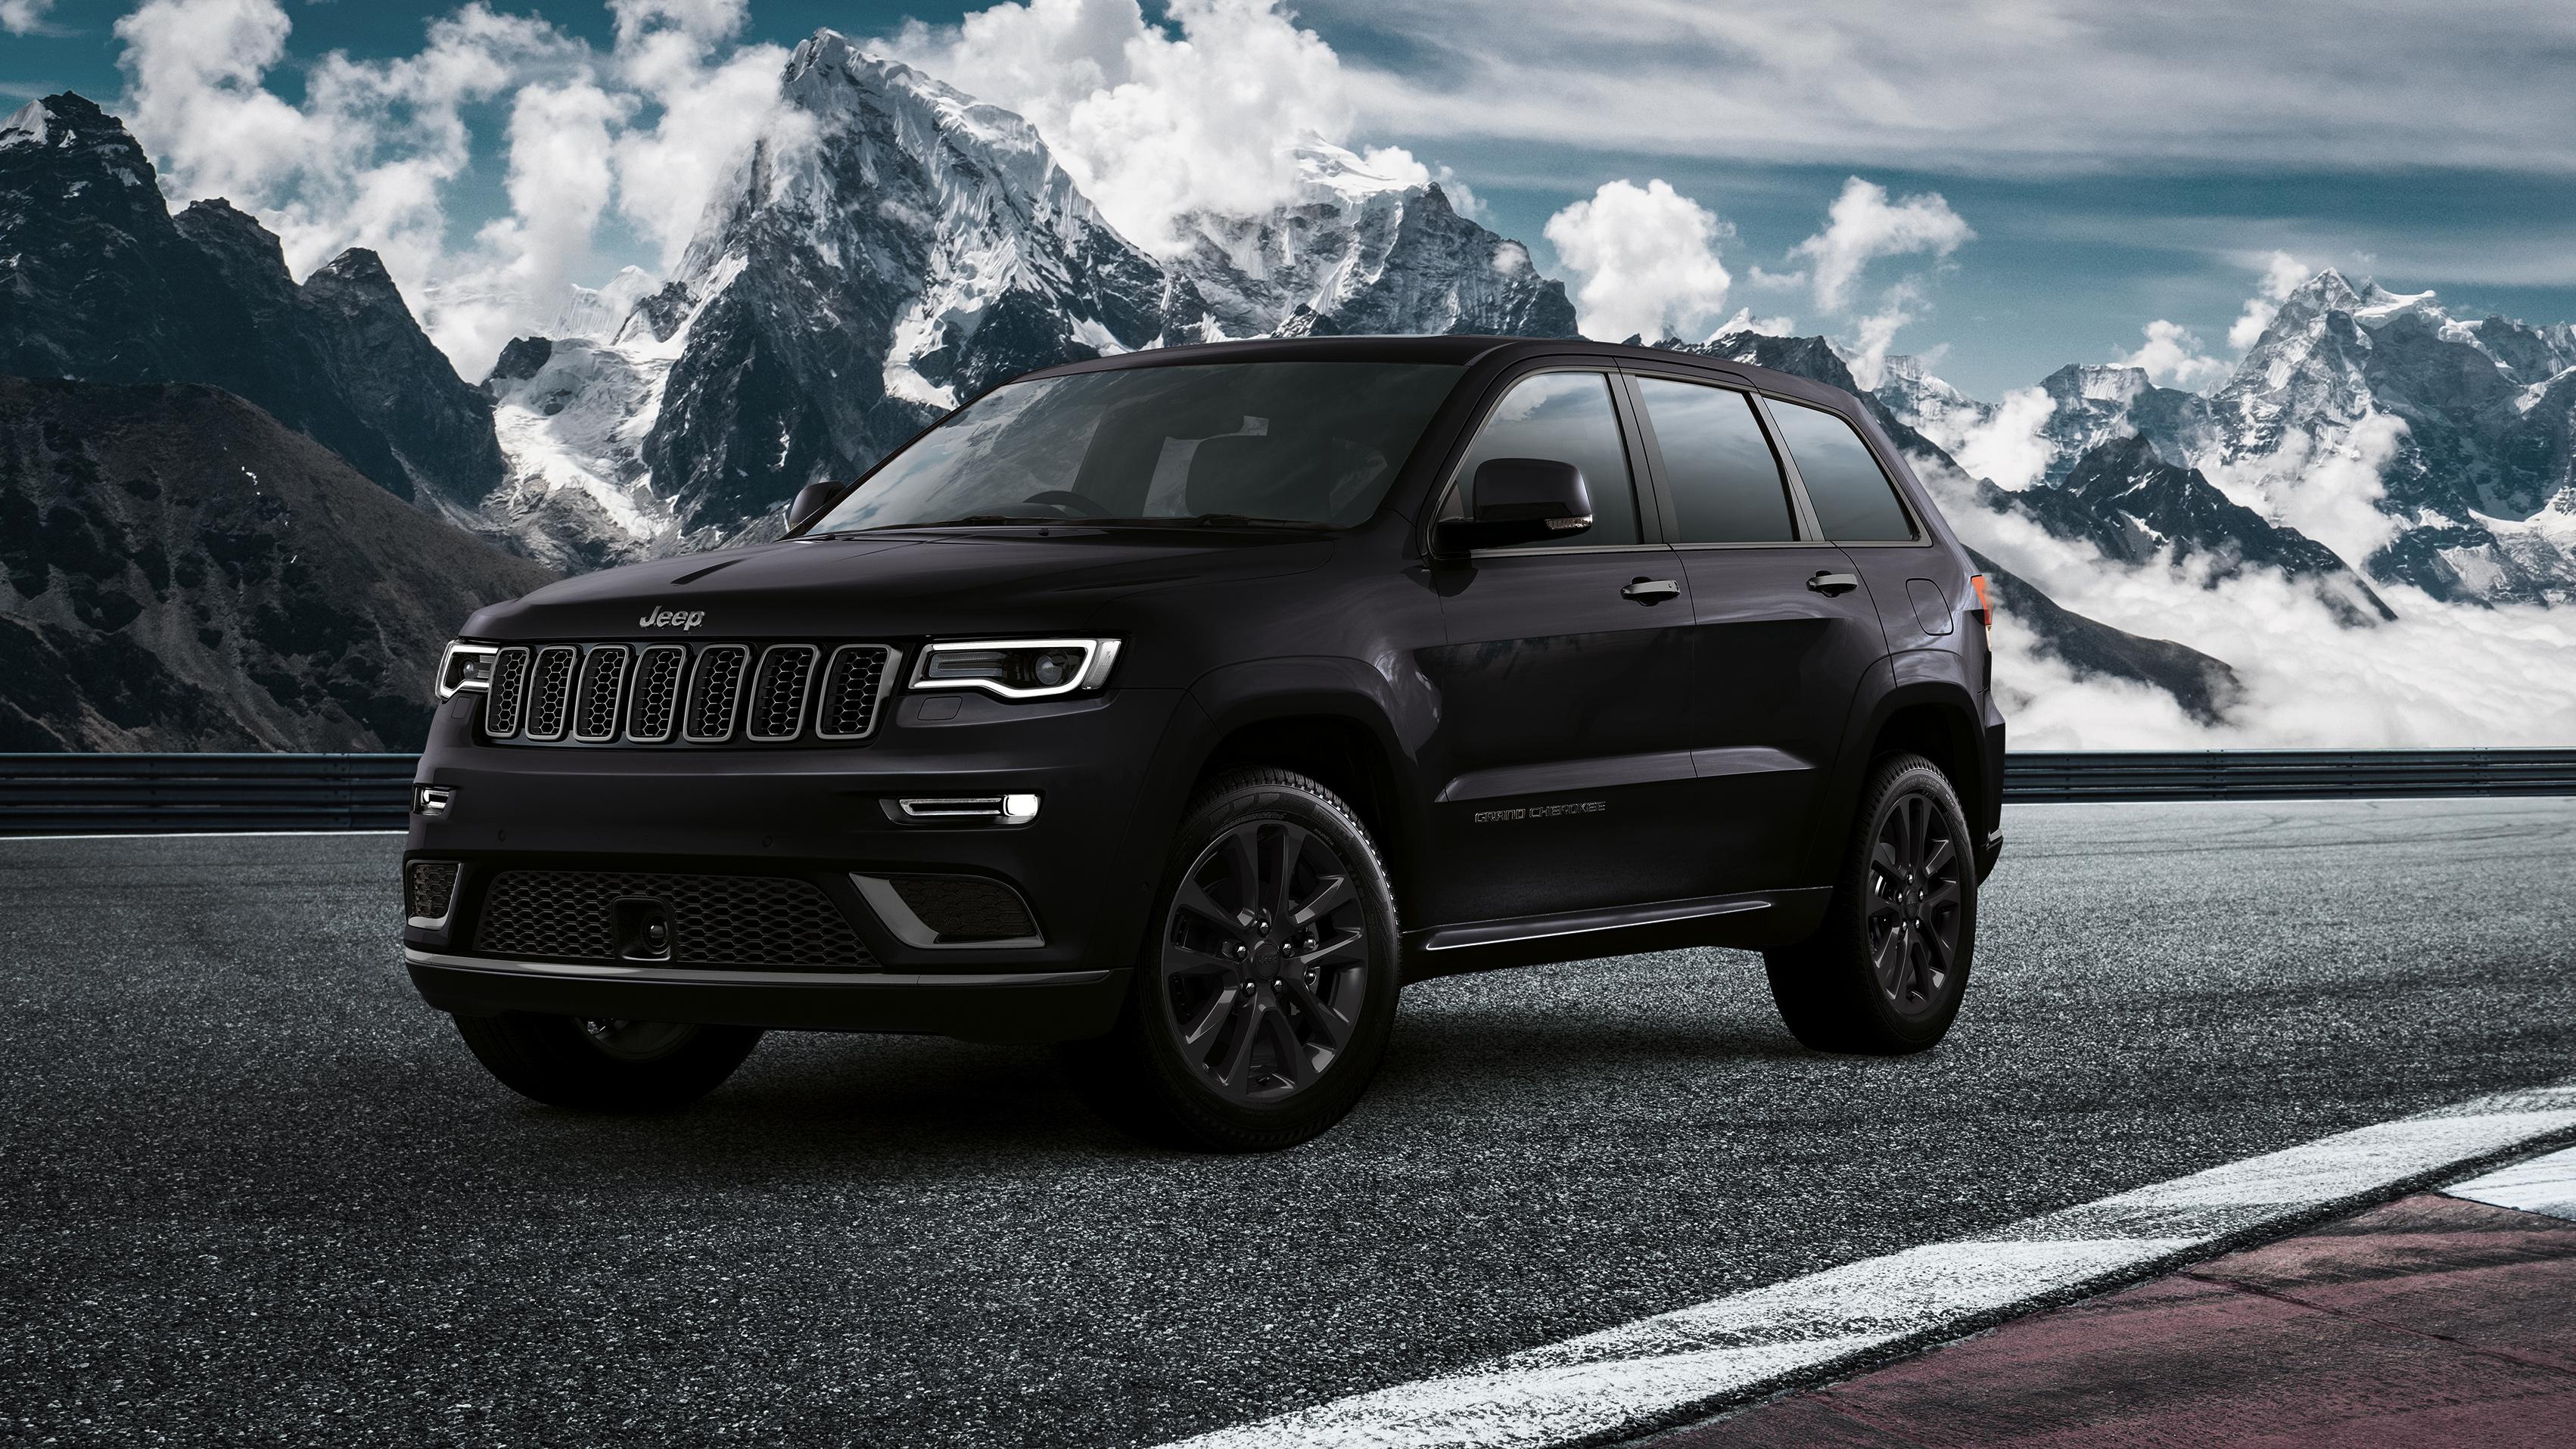 2019 Jeep Grand Cherokee S Wallpaper   HD Car Wallpapers ...